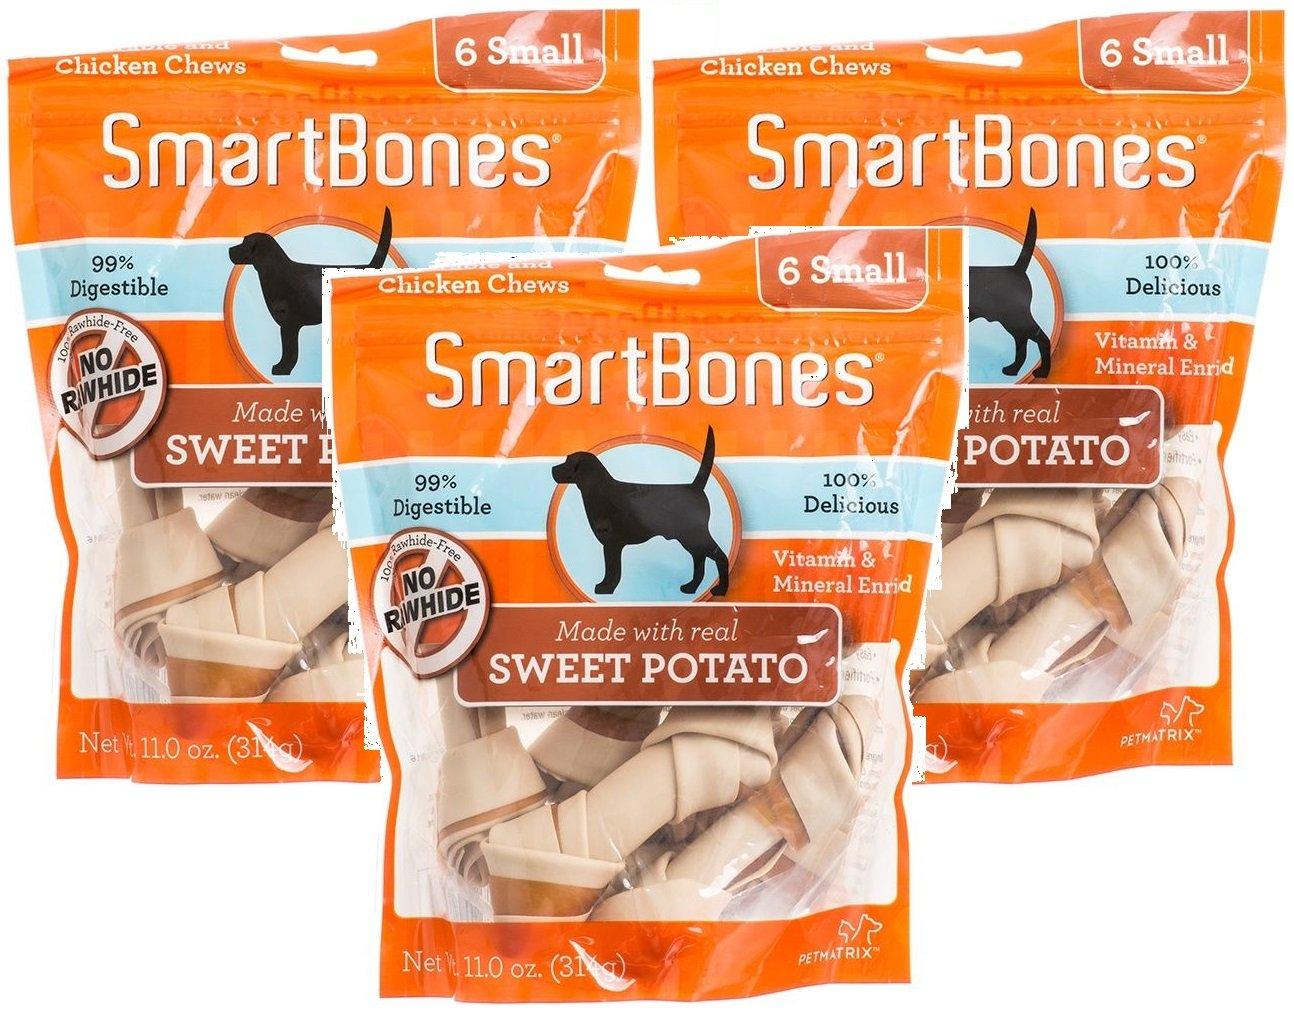 (3 Pack) SmartBones Vegetable and Chicken Small Bones with Real Sweet Potato - (6 Bones Per Package / 18 Bones Total)